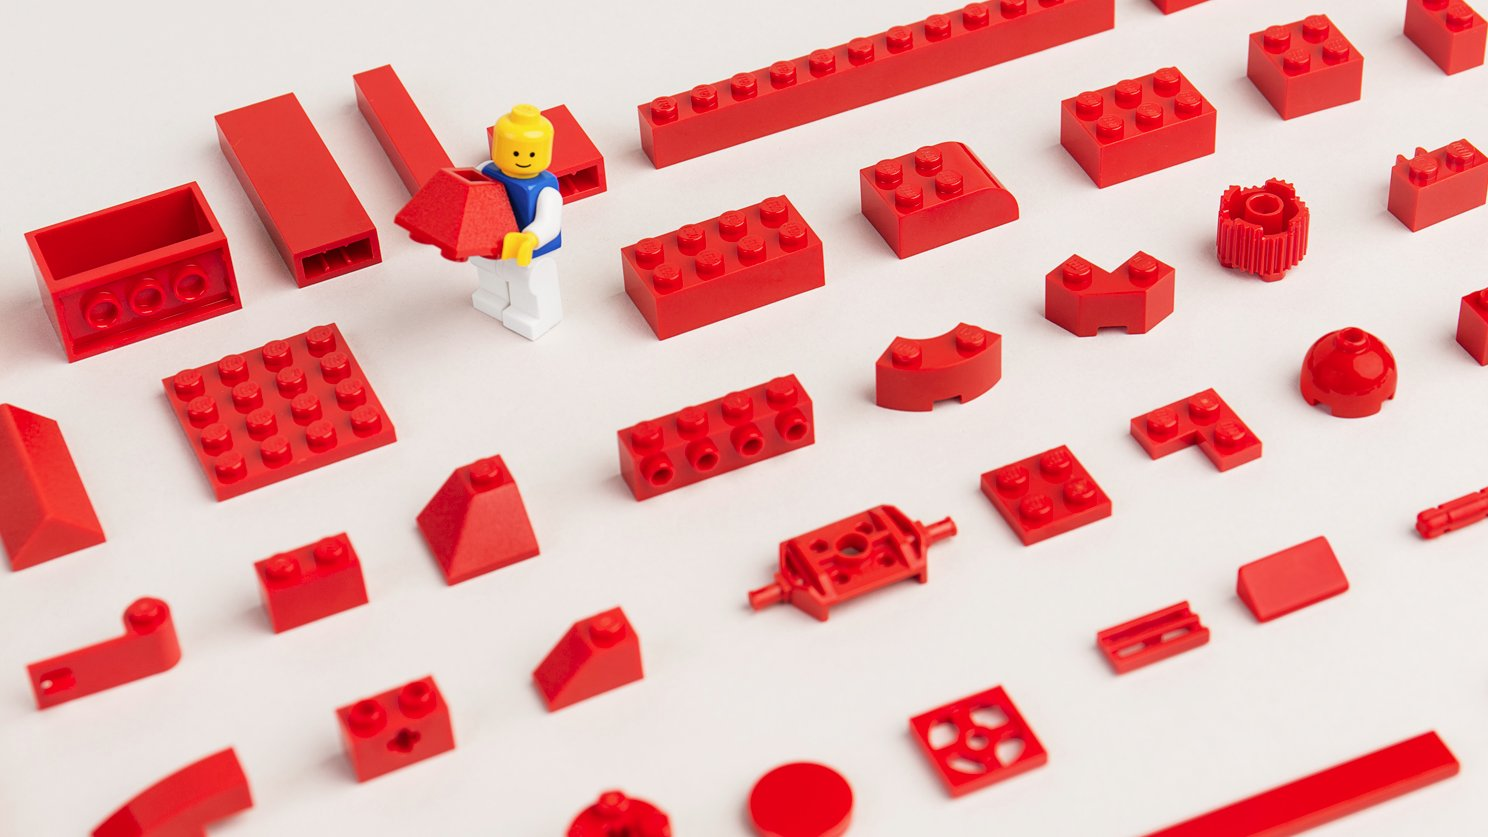 Design system : LEGO